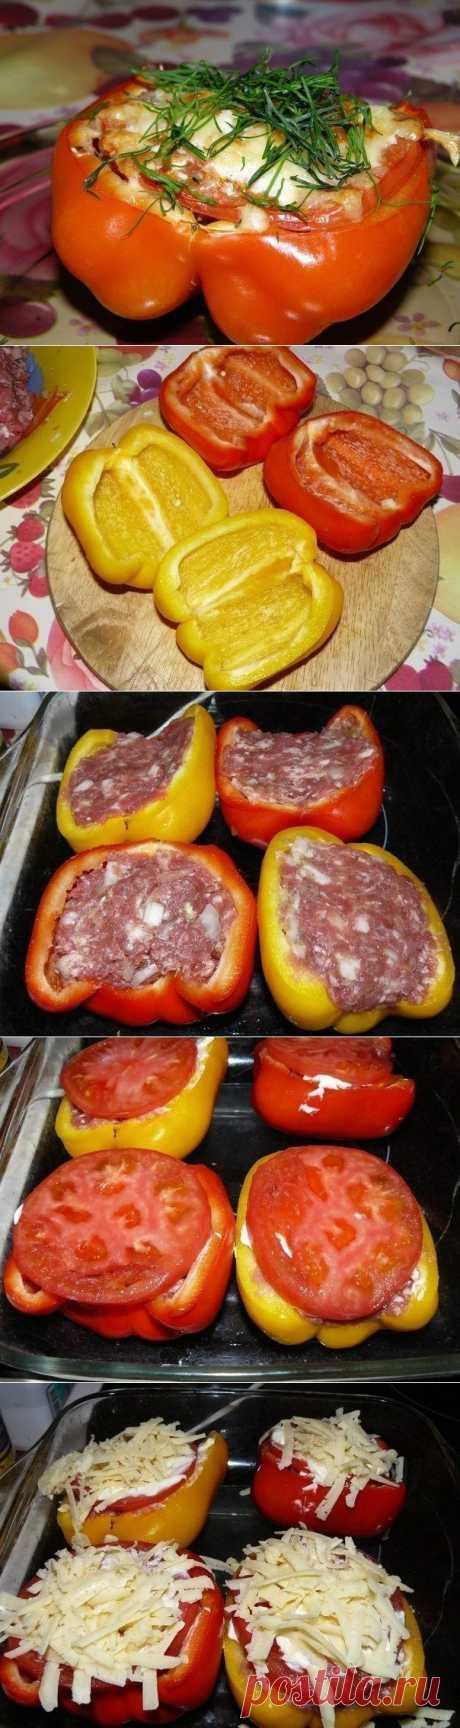 The pepper stuffed.